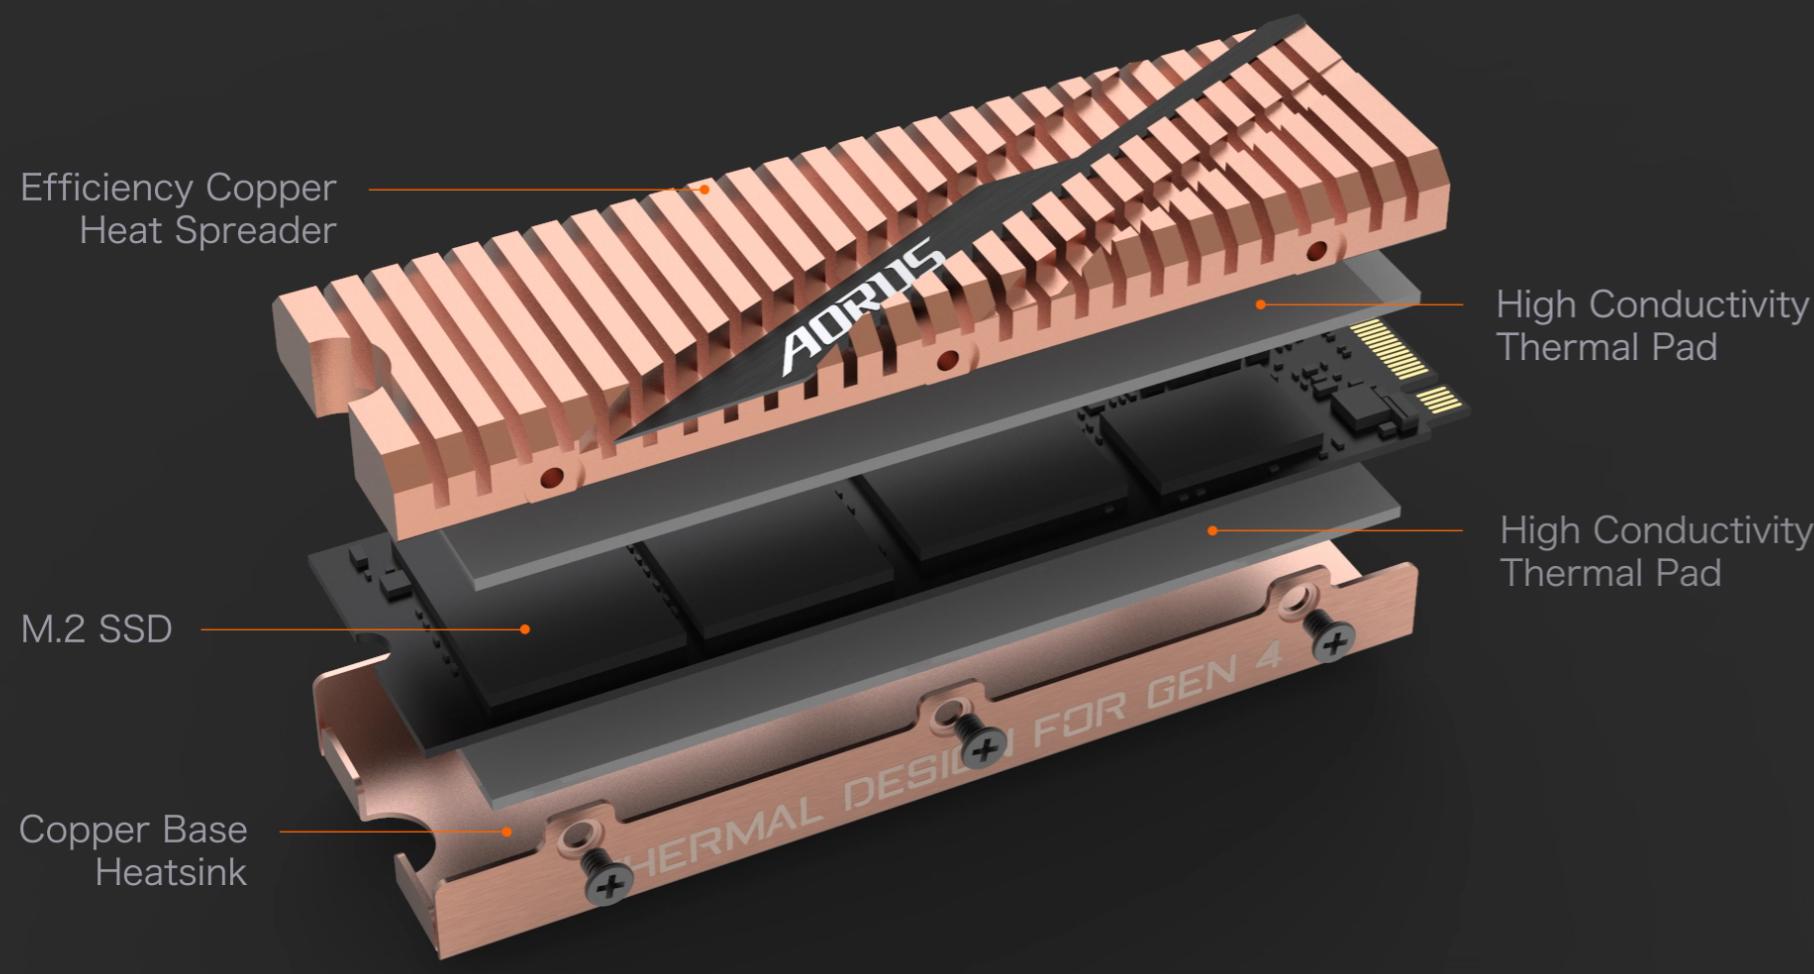 Aorus announces NVMe PCIe Gen 4 SSDs with 5 GB/s read speeds